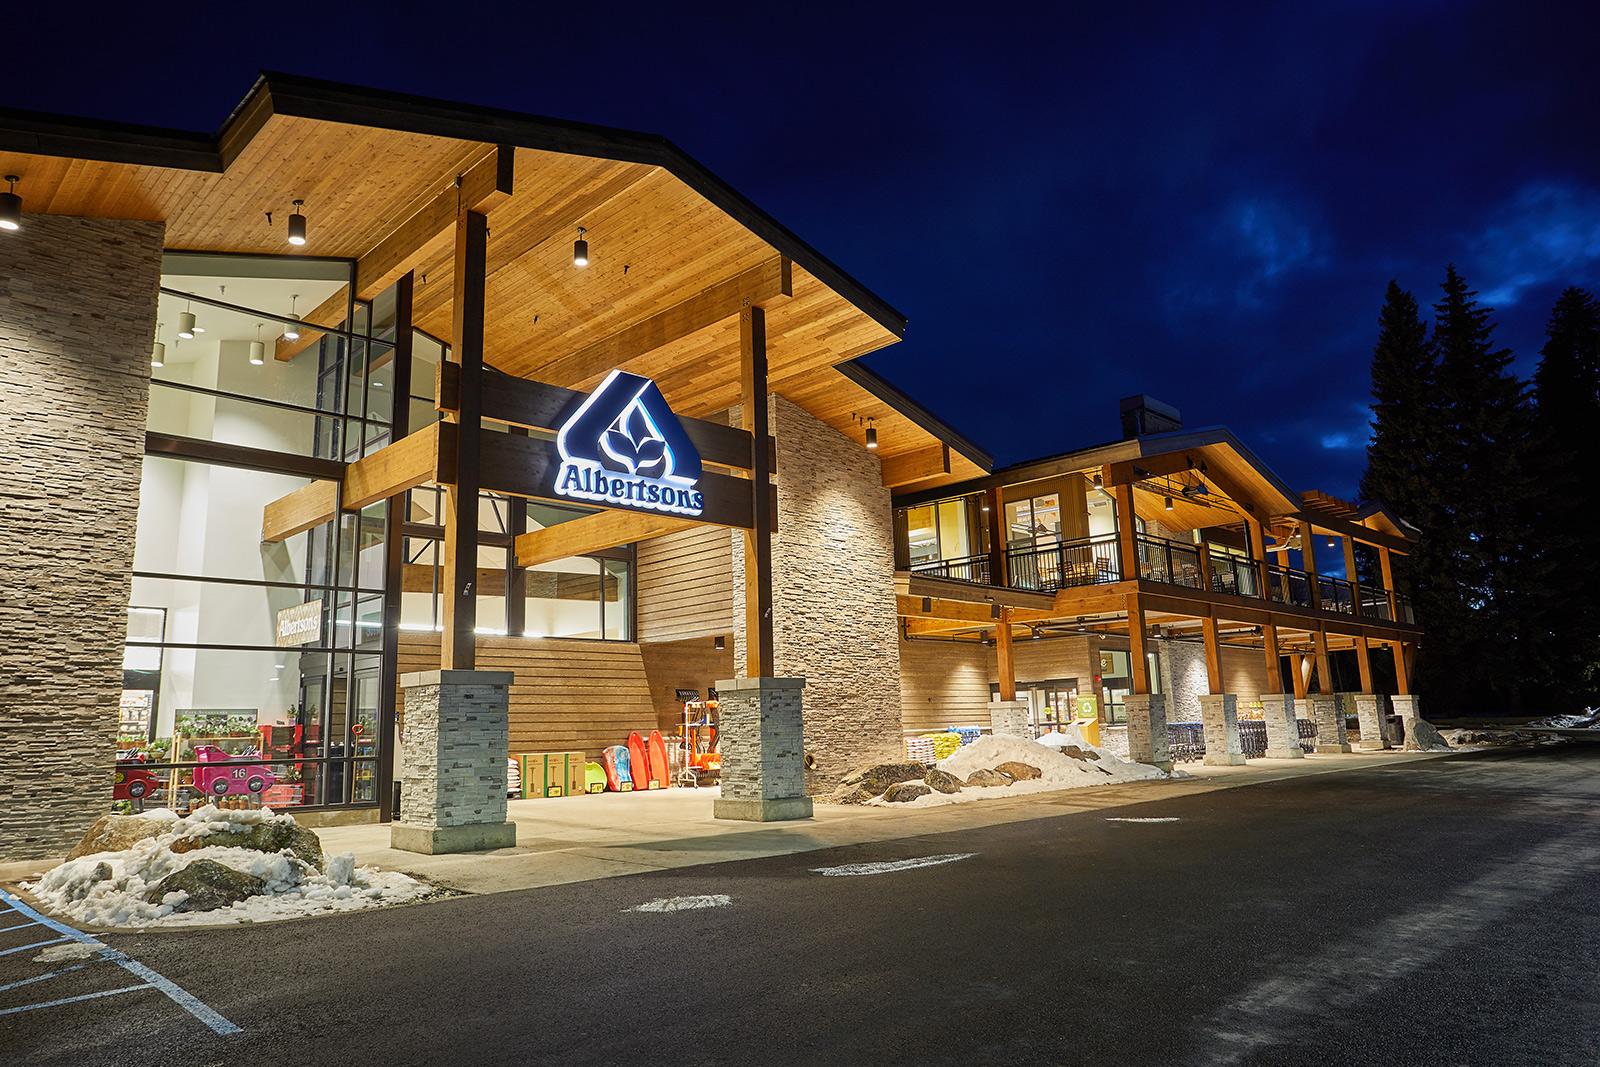 Albertson exteriors in McCall, Idaho